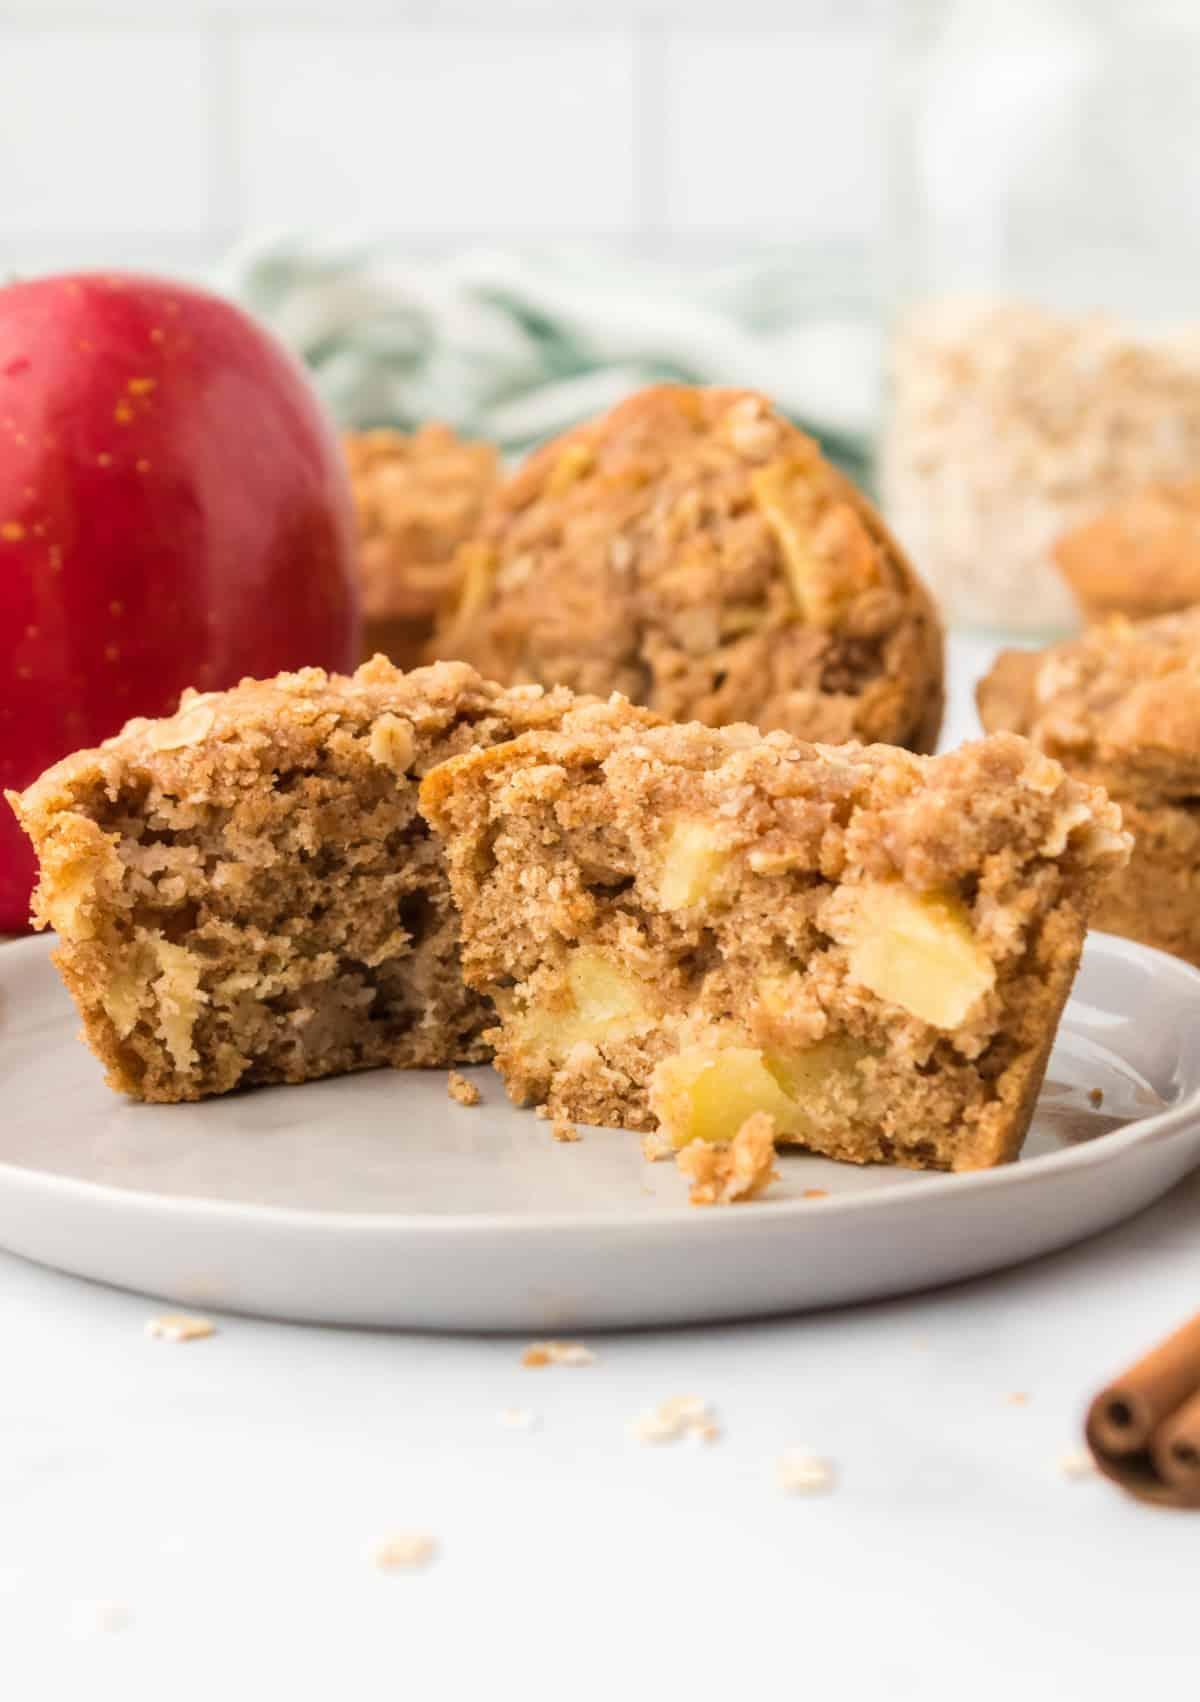 One apple cinnamon muffin cut in half.